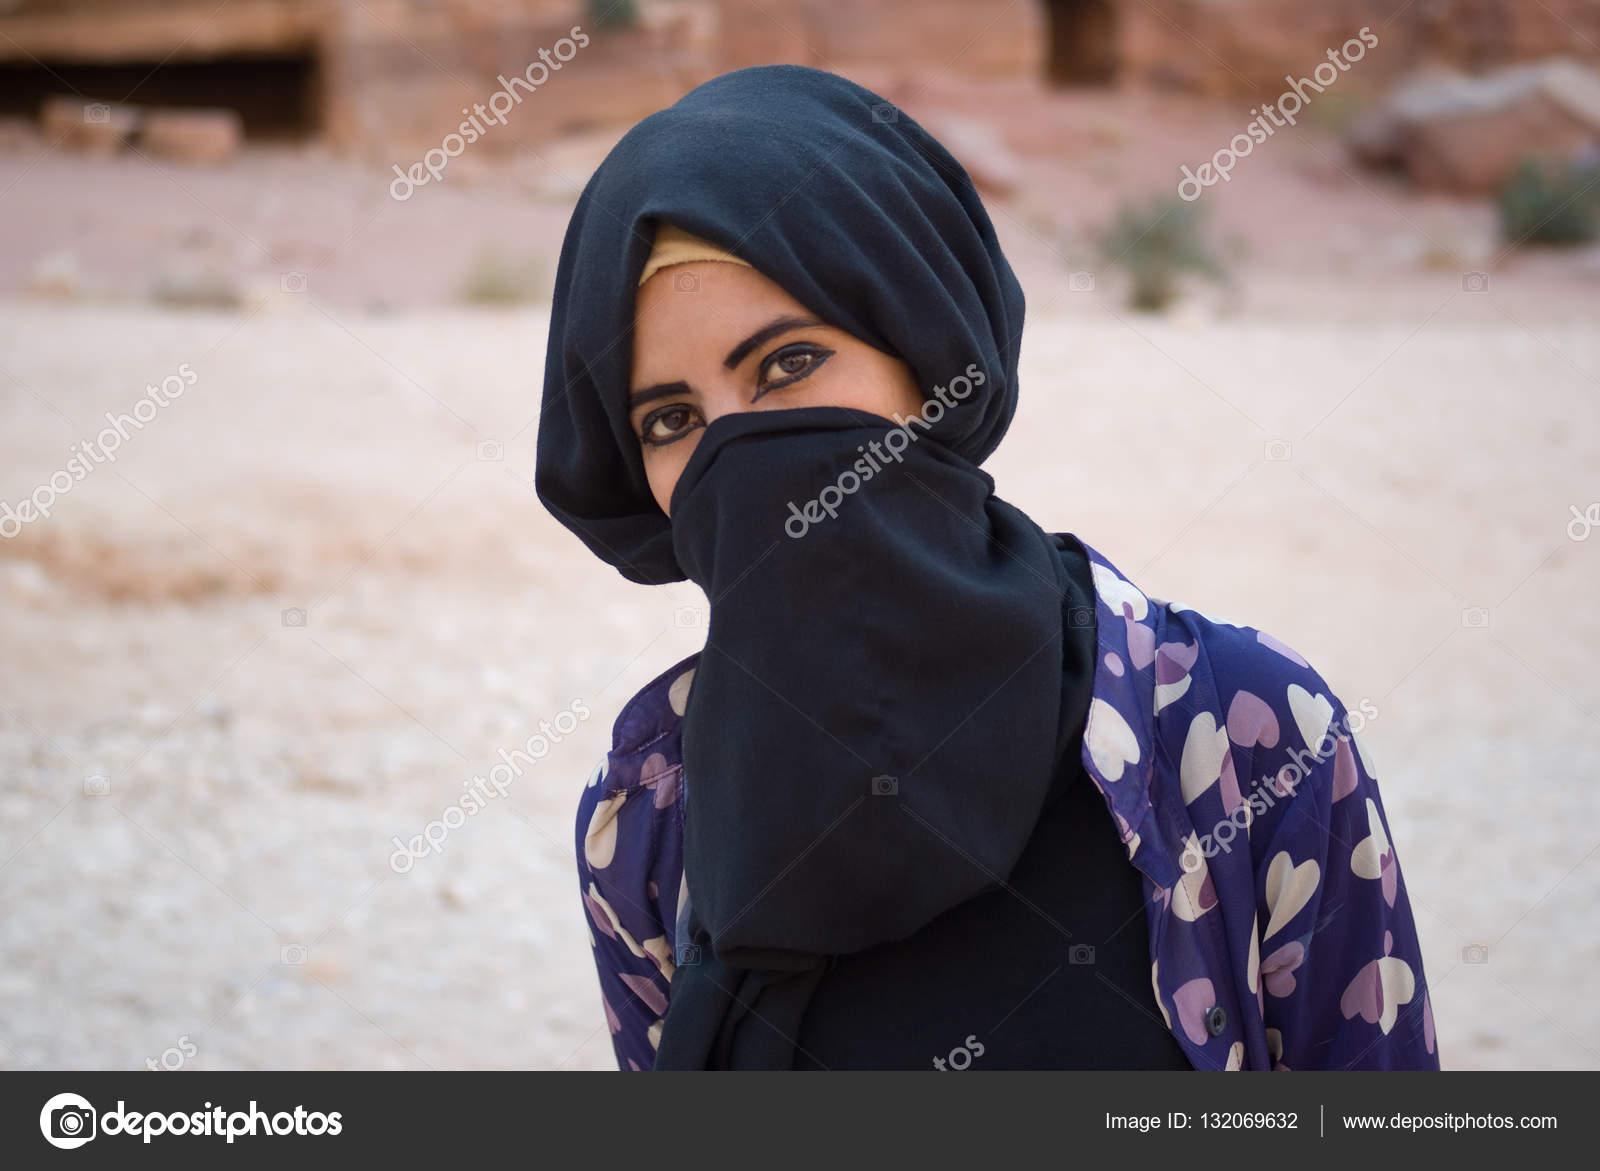 finest selection 98faf c6878 Petra, Jordan - October 26, 2016  Close up of a Bedouin girl with hidden  face behind veil posing at camera — Photo by surkovdimitri